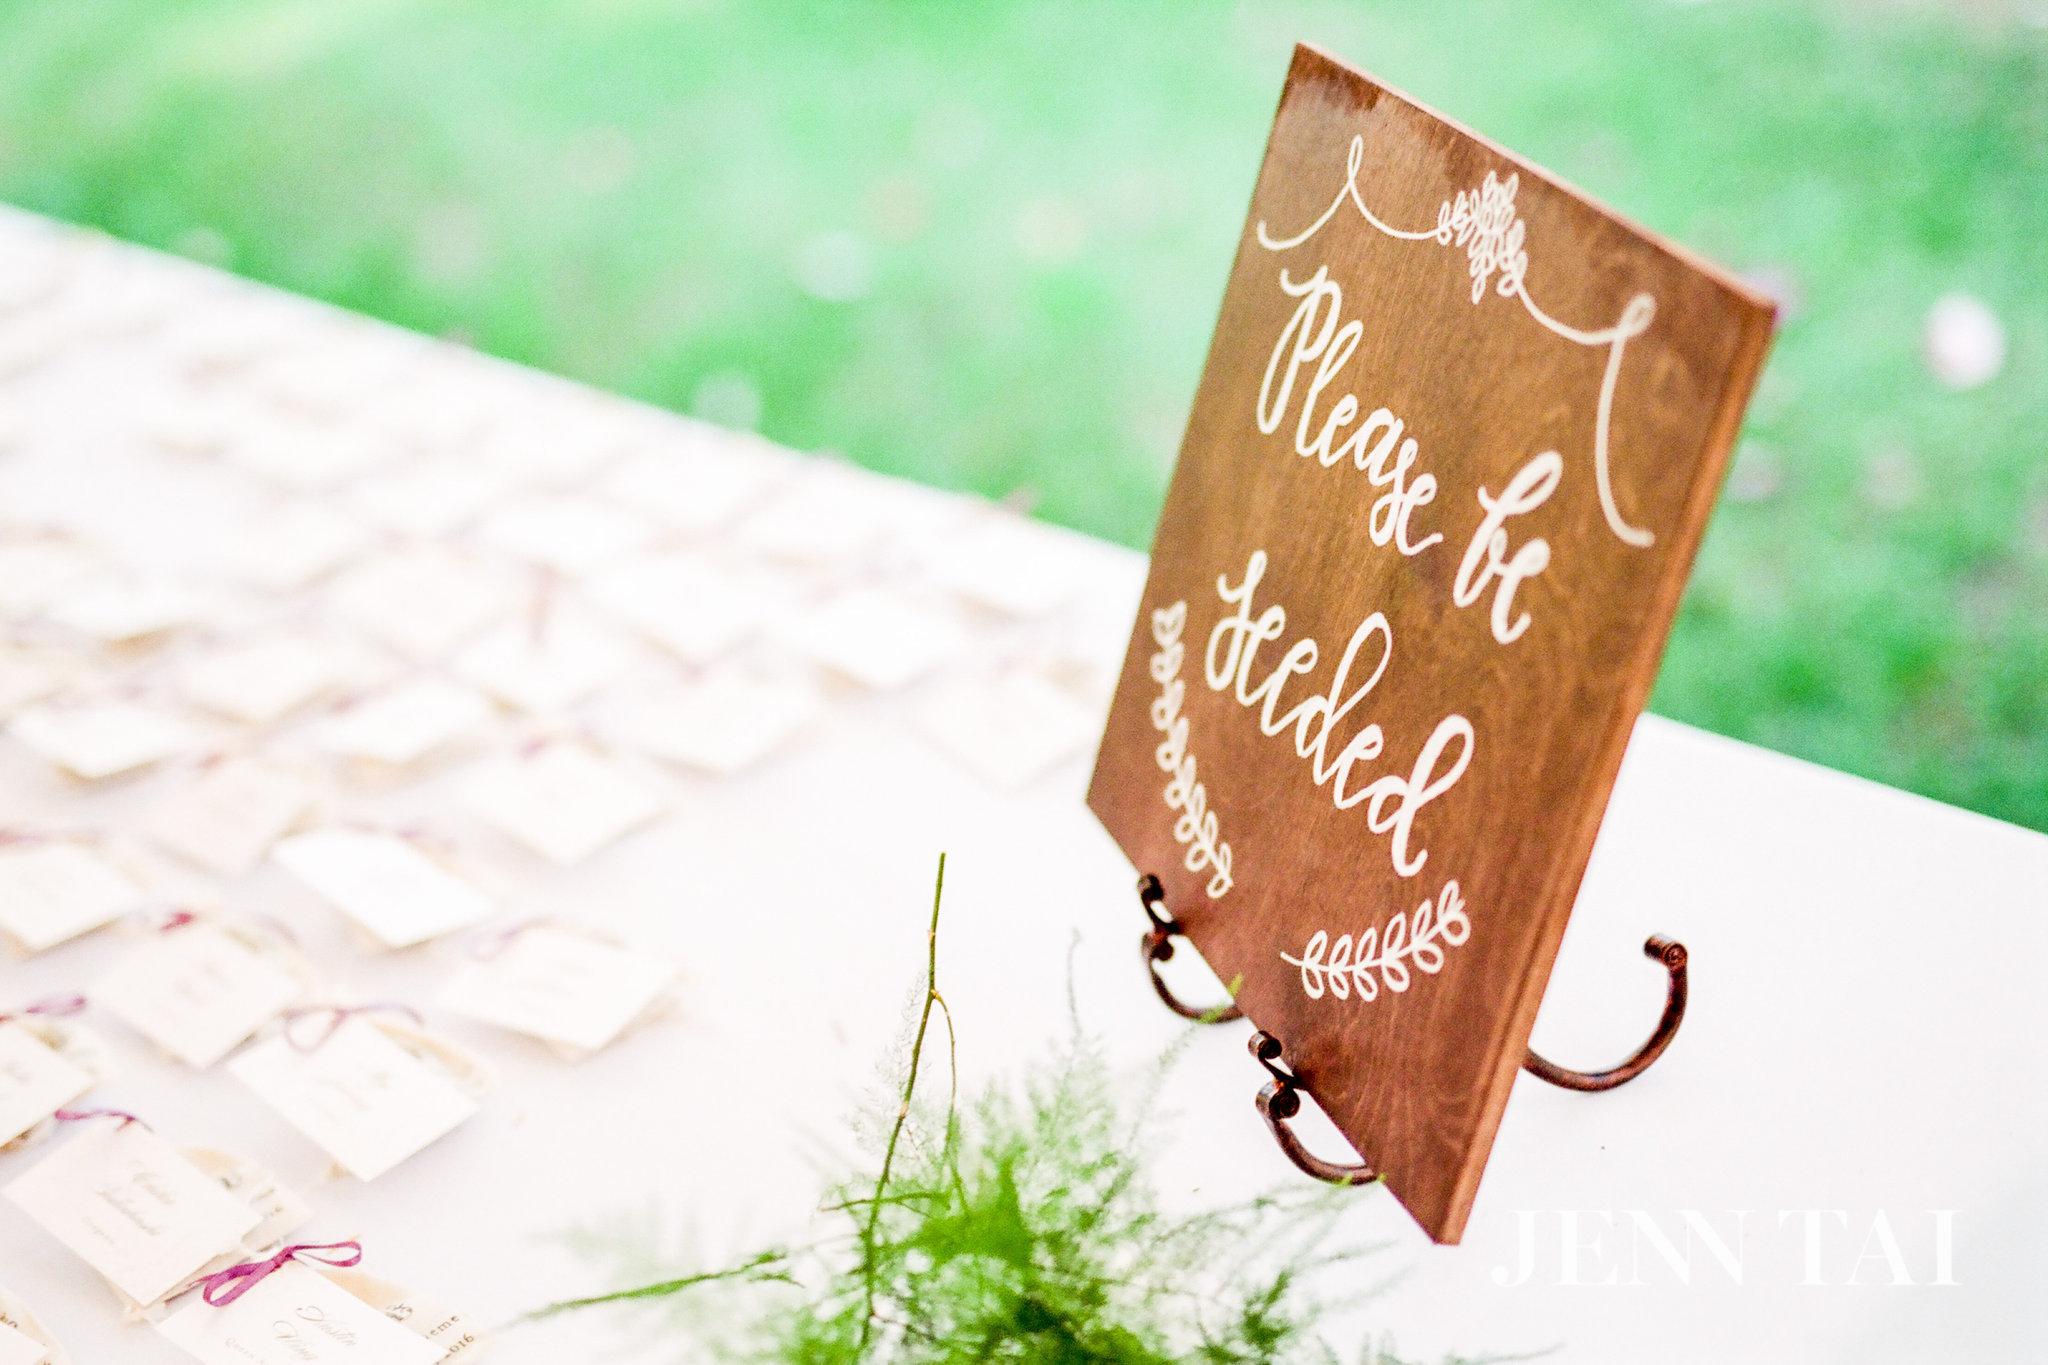 kingston-house-weddings-katherine-and-graeme-details_-22.jpg